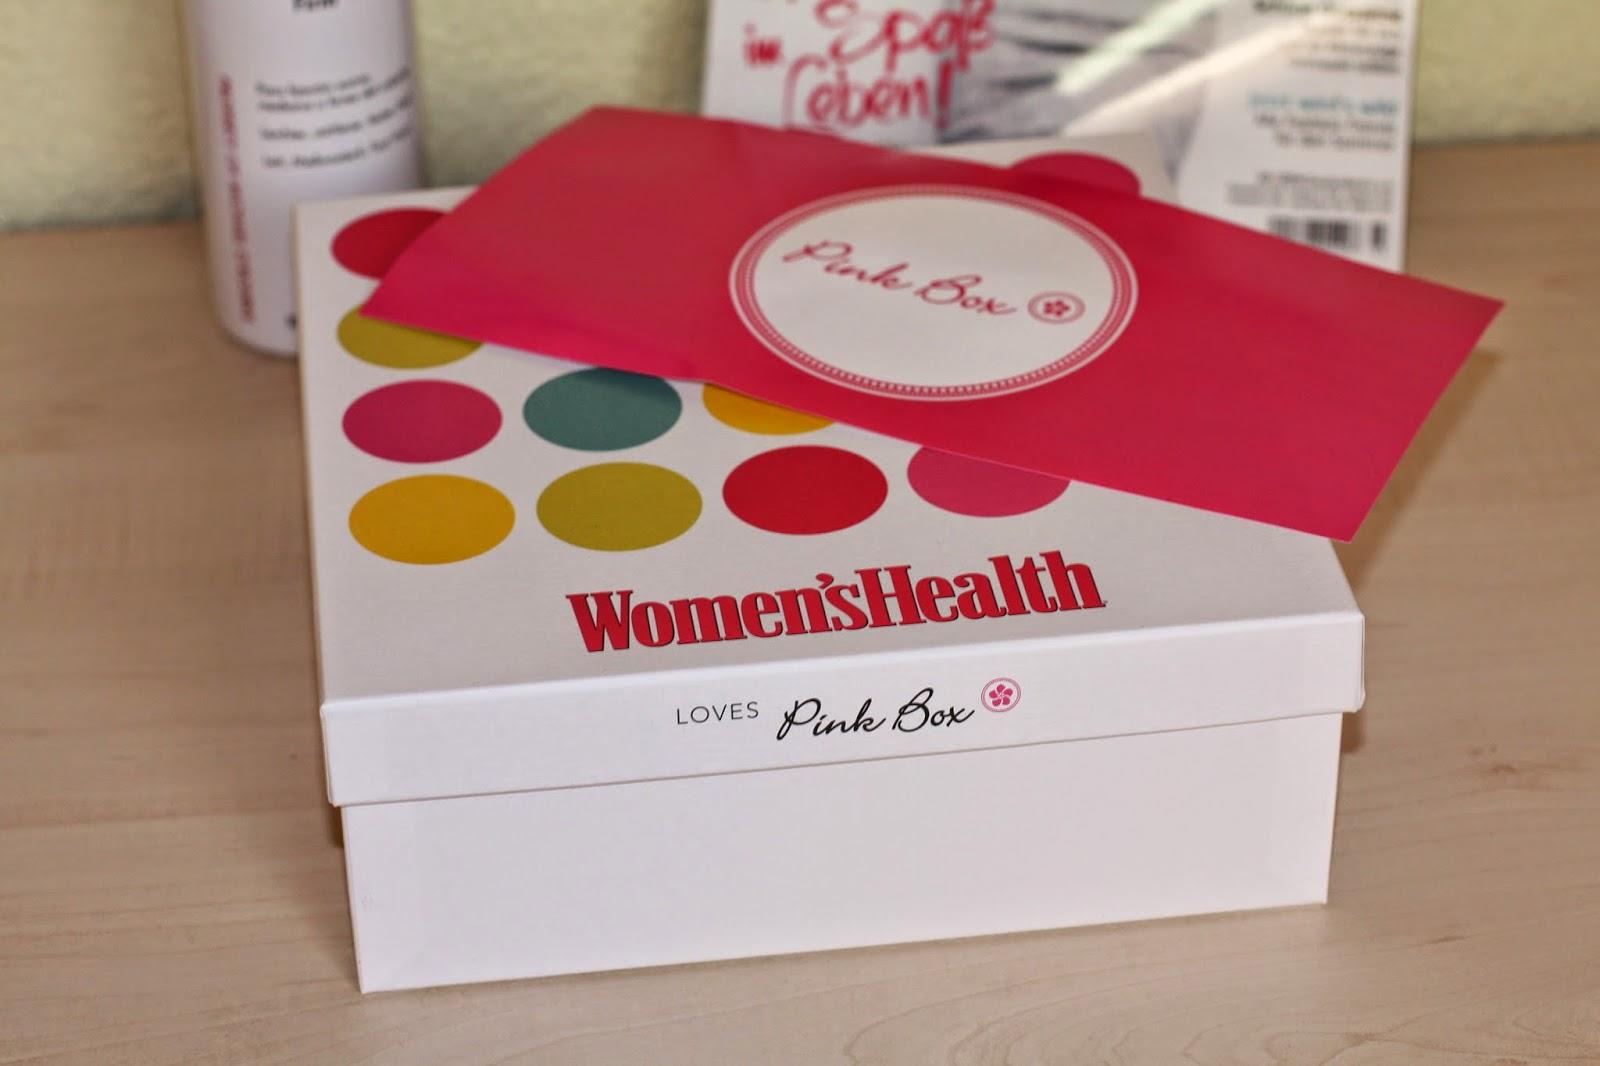 Pink Box März, Special Pink Box, Pink Bos, Patrizia Paul, Beauty Box, Woman's Health Pink Box